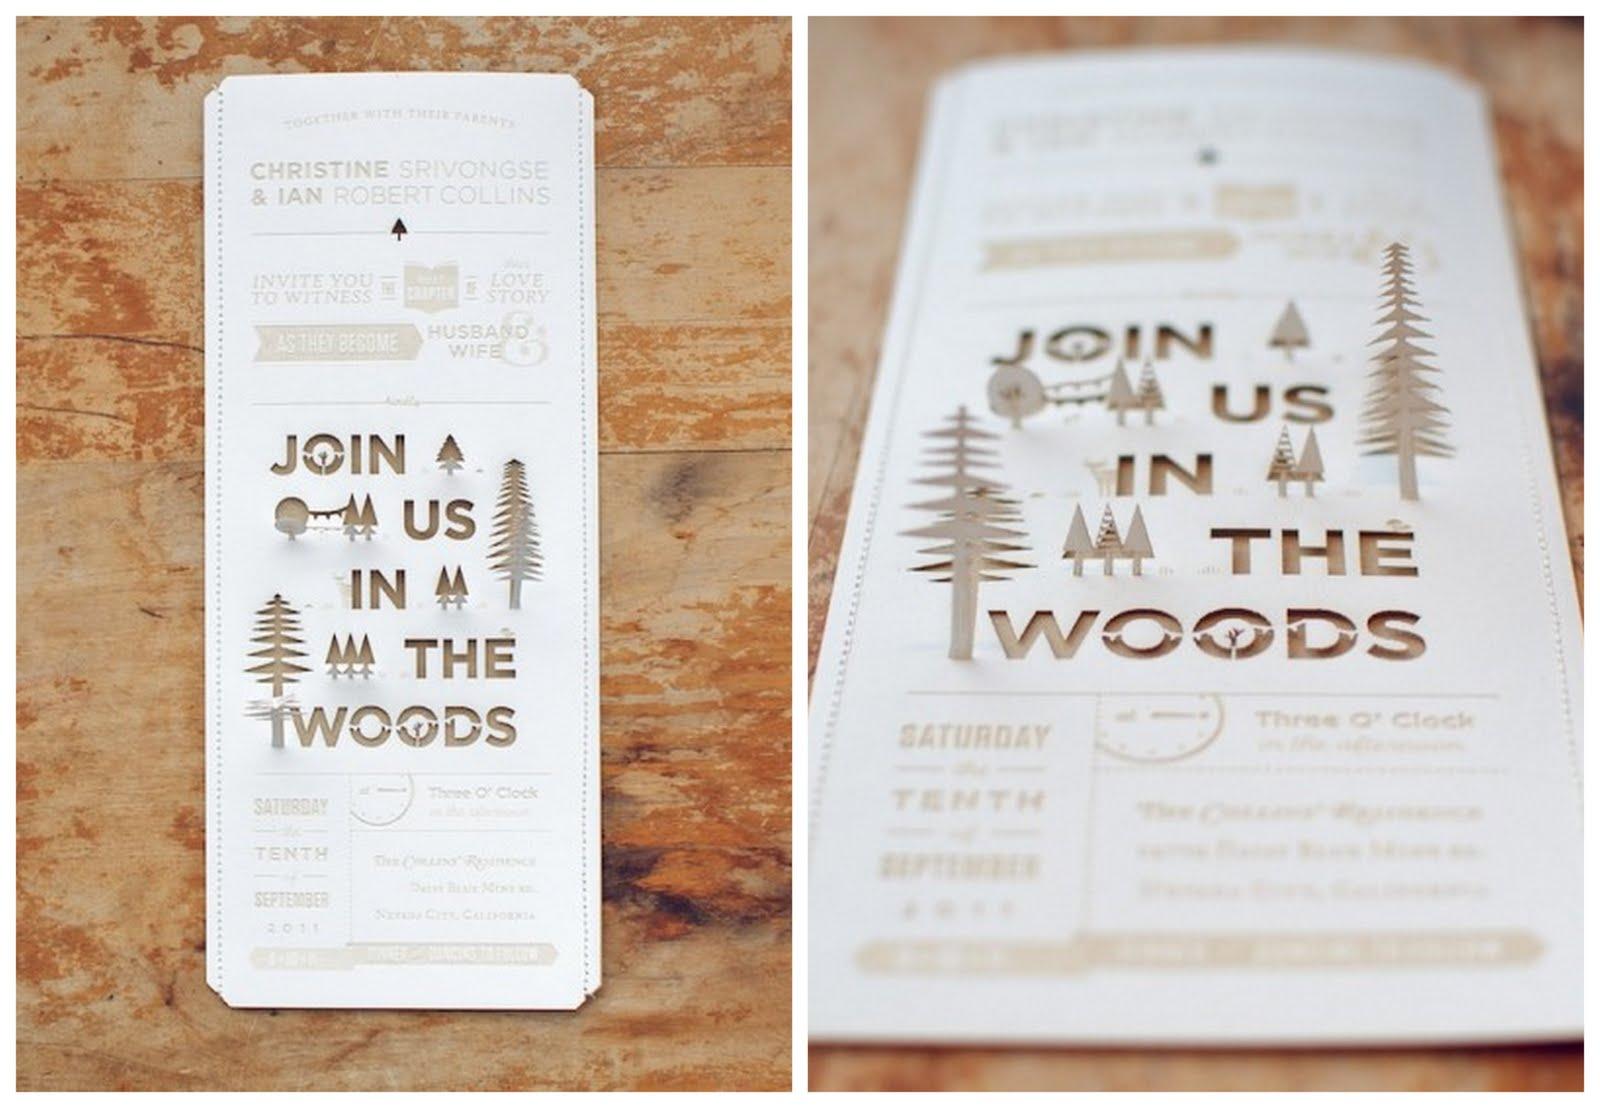 Diy Wedding Invitations Uk Ideas Monicamarmolfo Image Collections